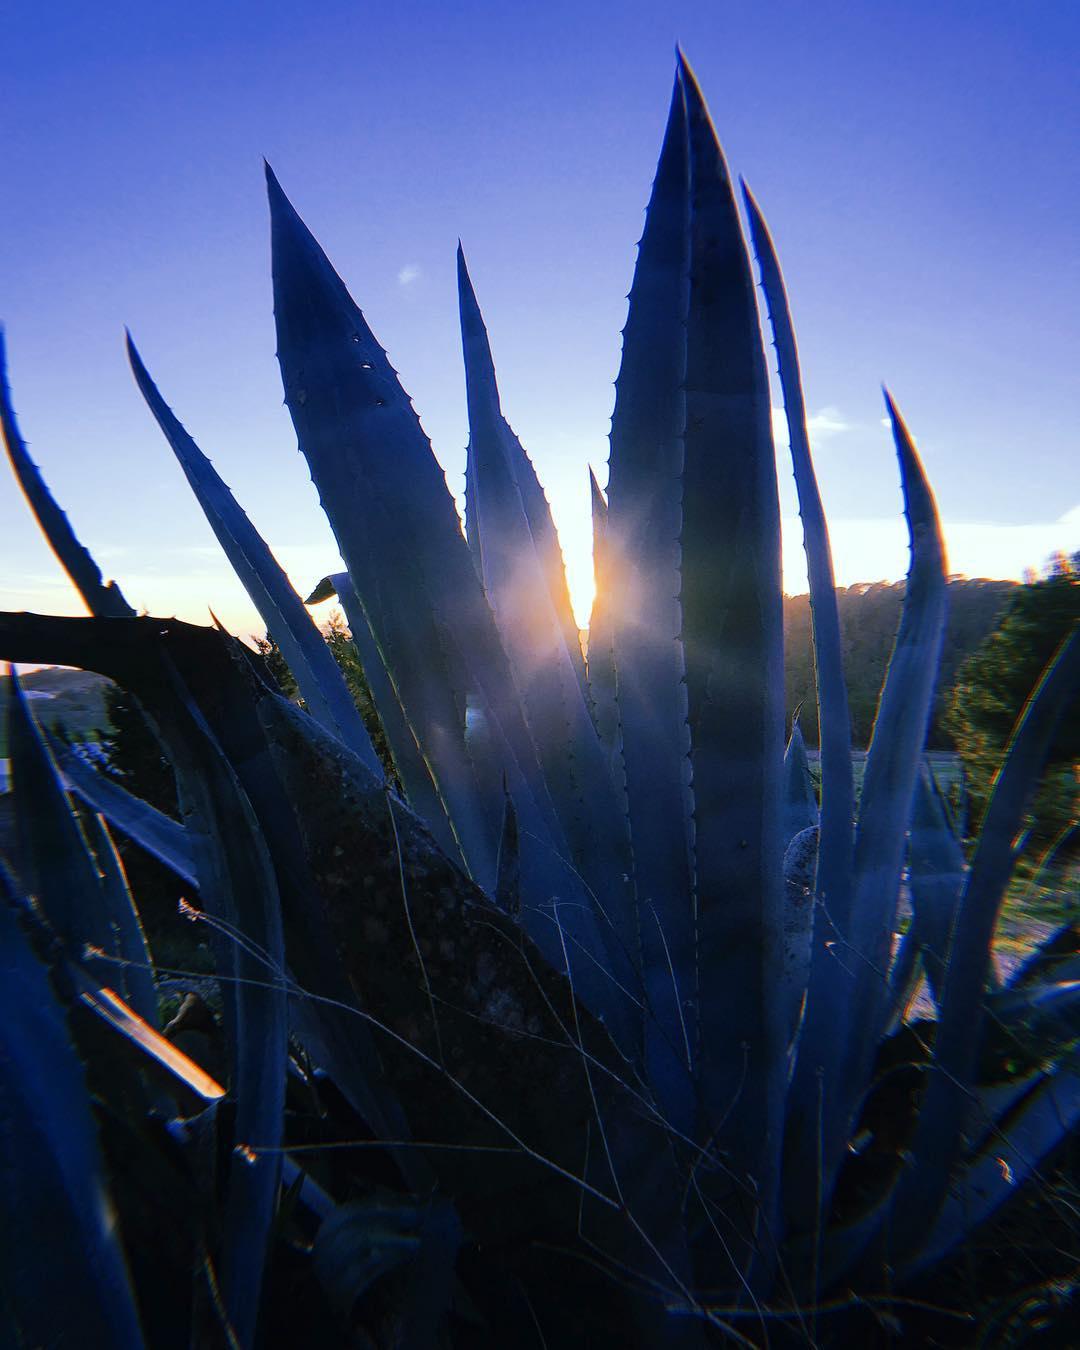 // November Day // #nature #campo #blue #agave #cactus #mediterranean #flora #ibiza #love #lascicadasibiza #boutiquevilla #slowlife #islandlife #november #light #winterseason 💙